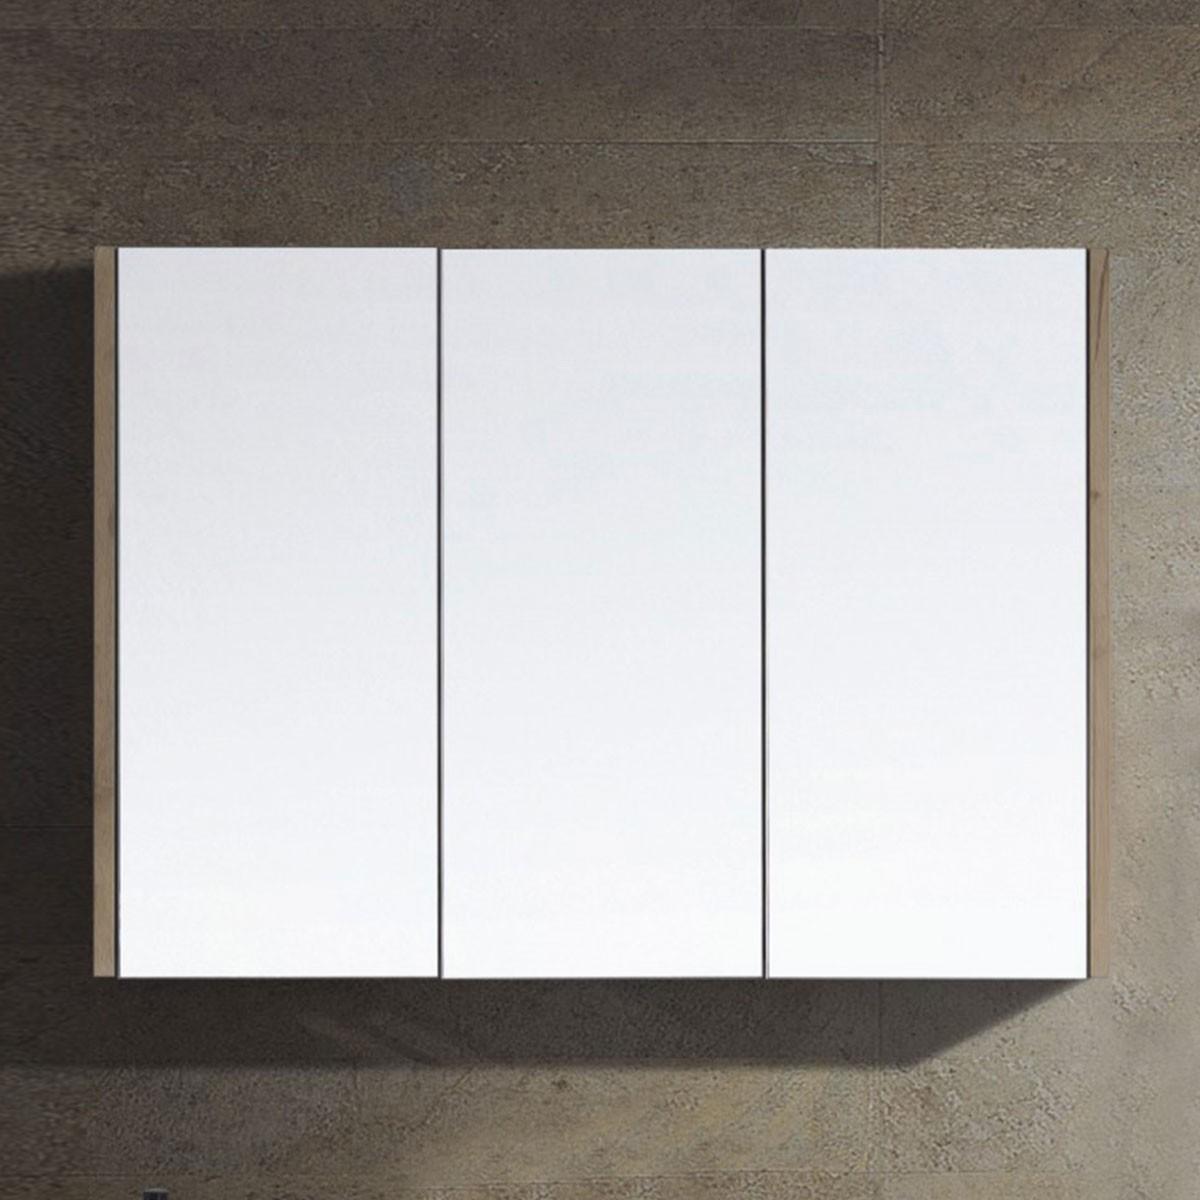 35 x 26 po Armoire-Miroir (TP1002-M)